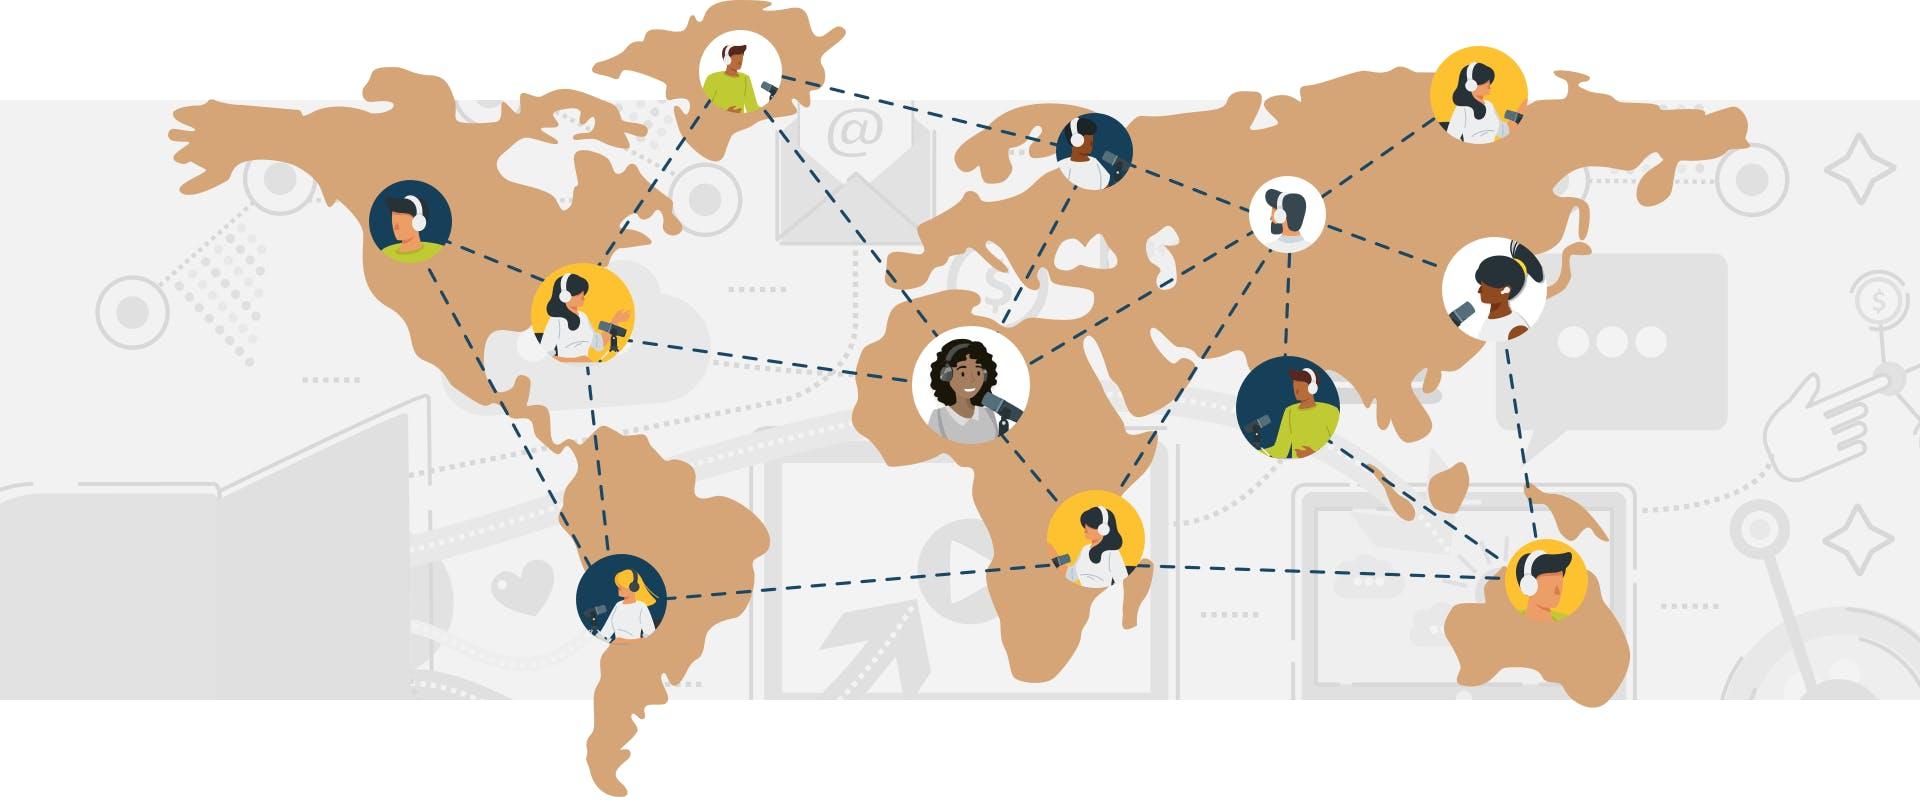 Global podcast community